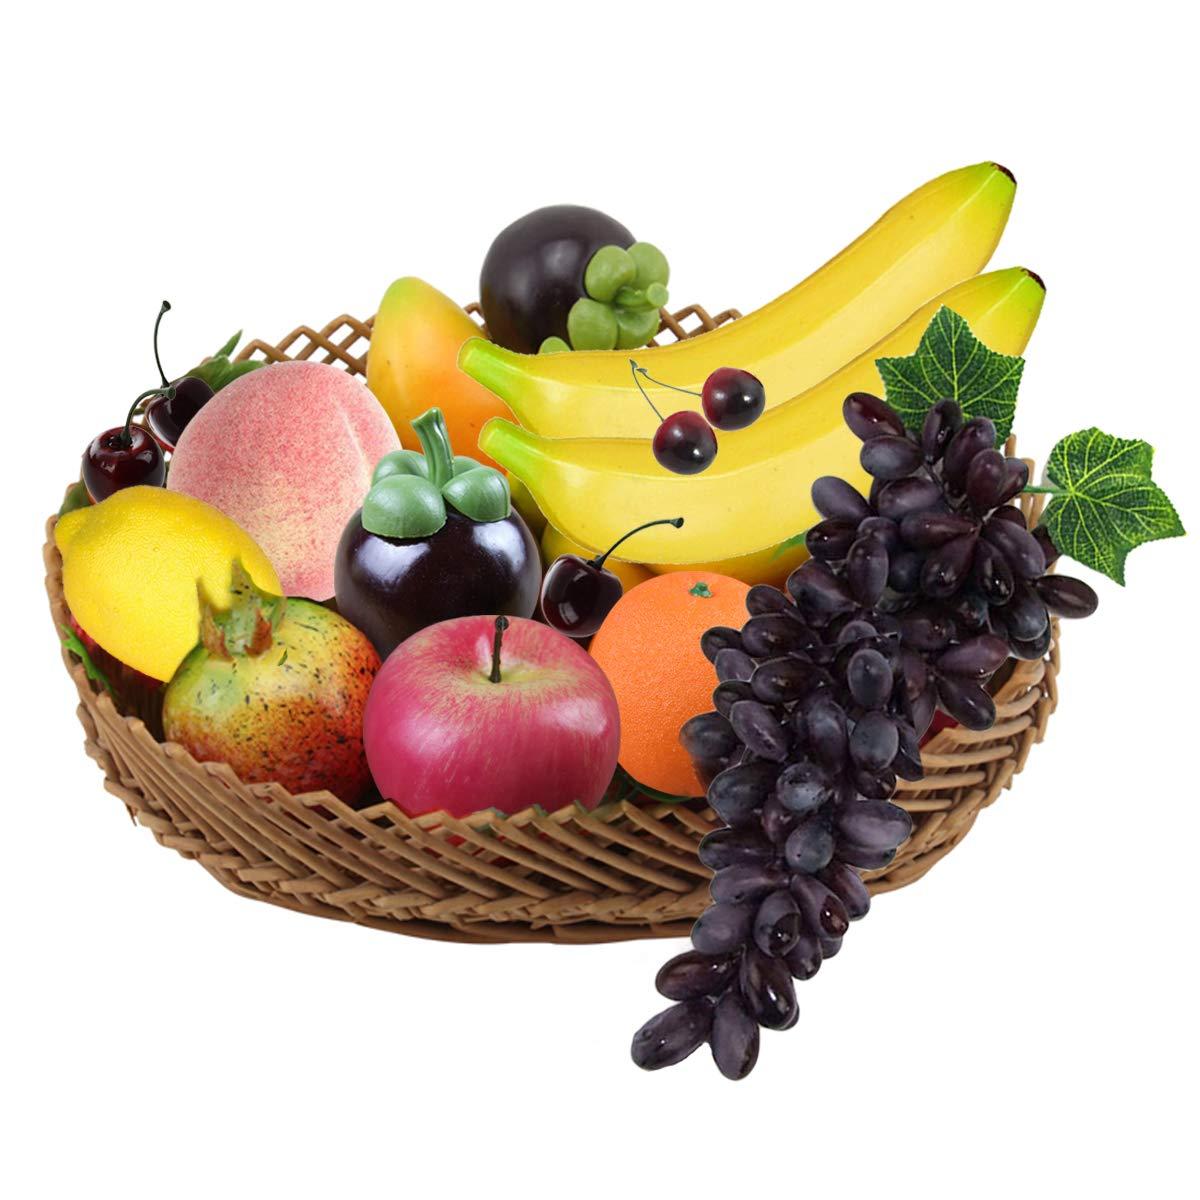 EQLEF® 10pcs Artificial Fruit Set for Decoration